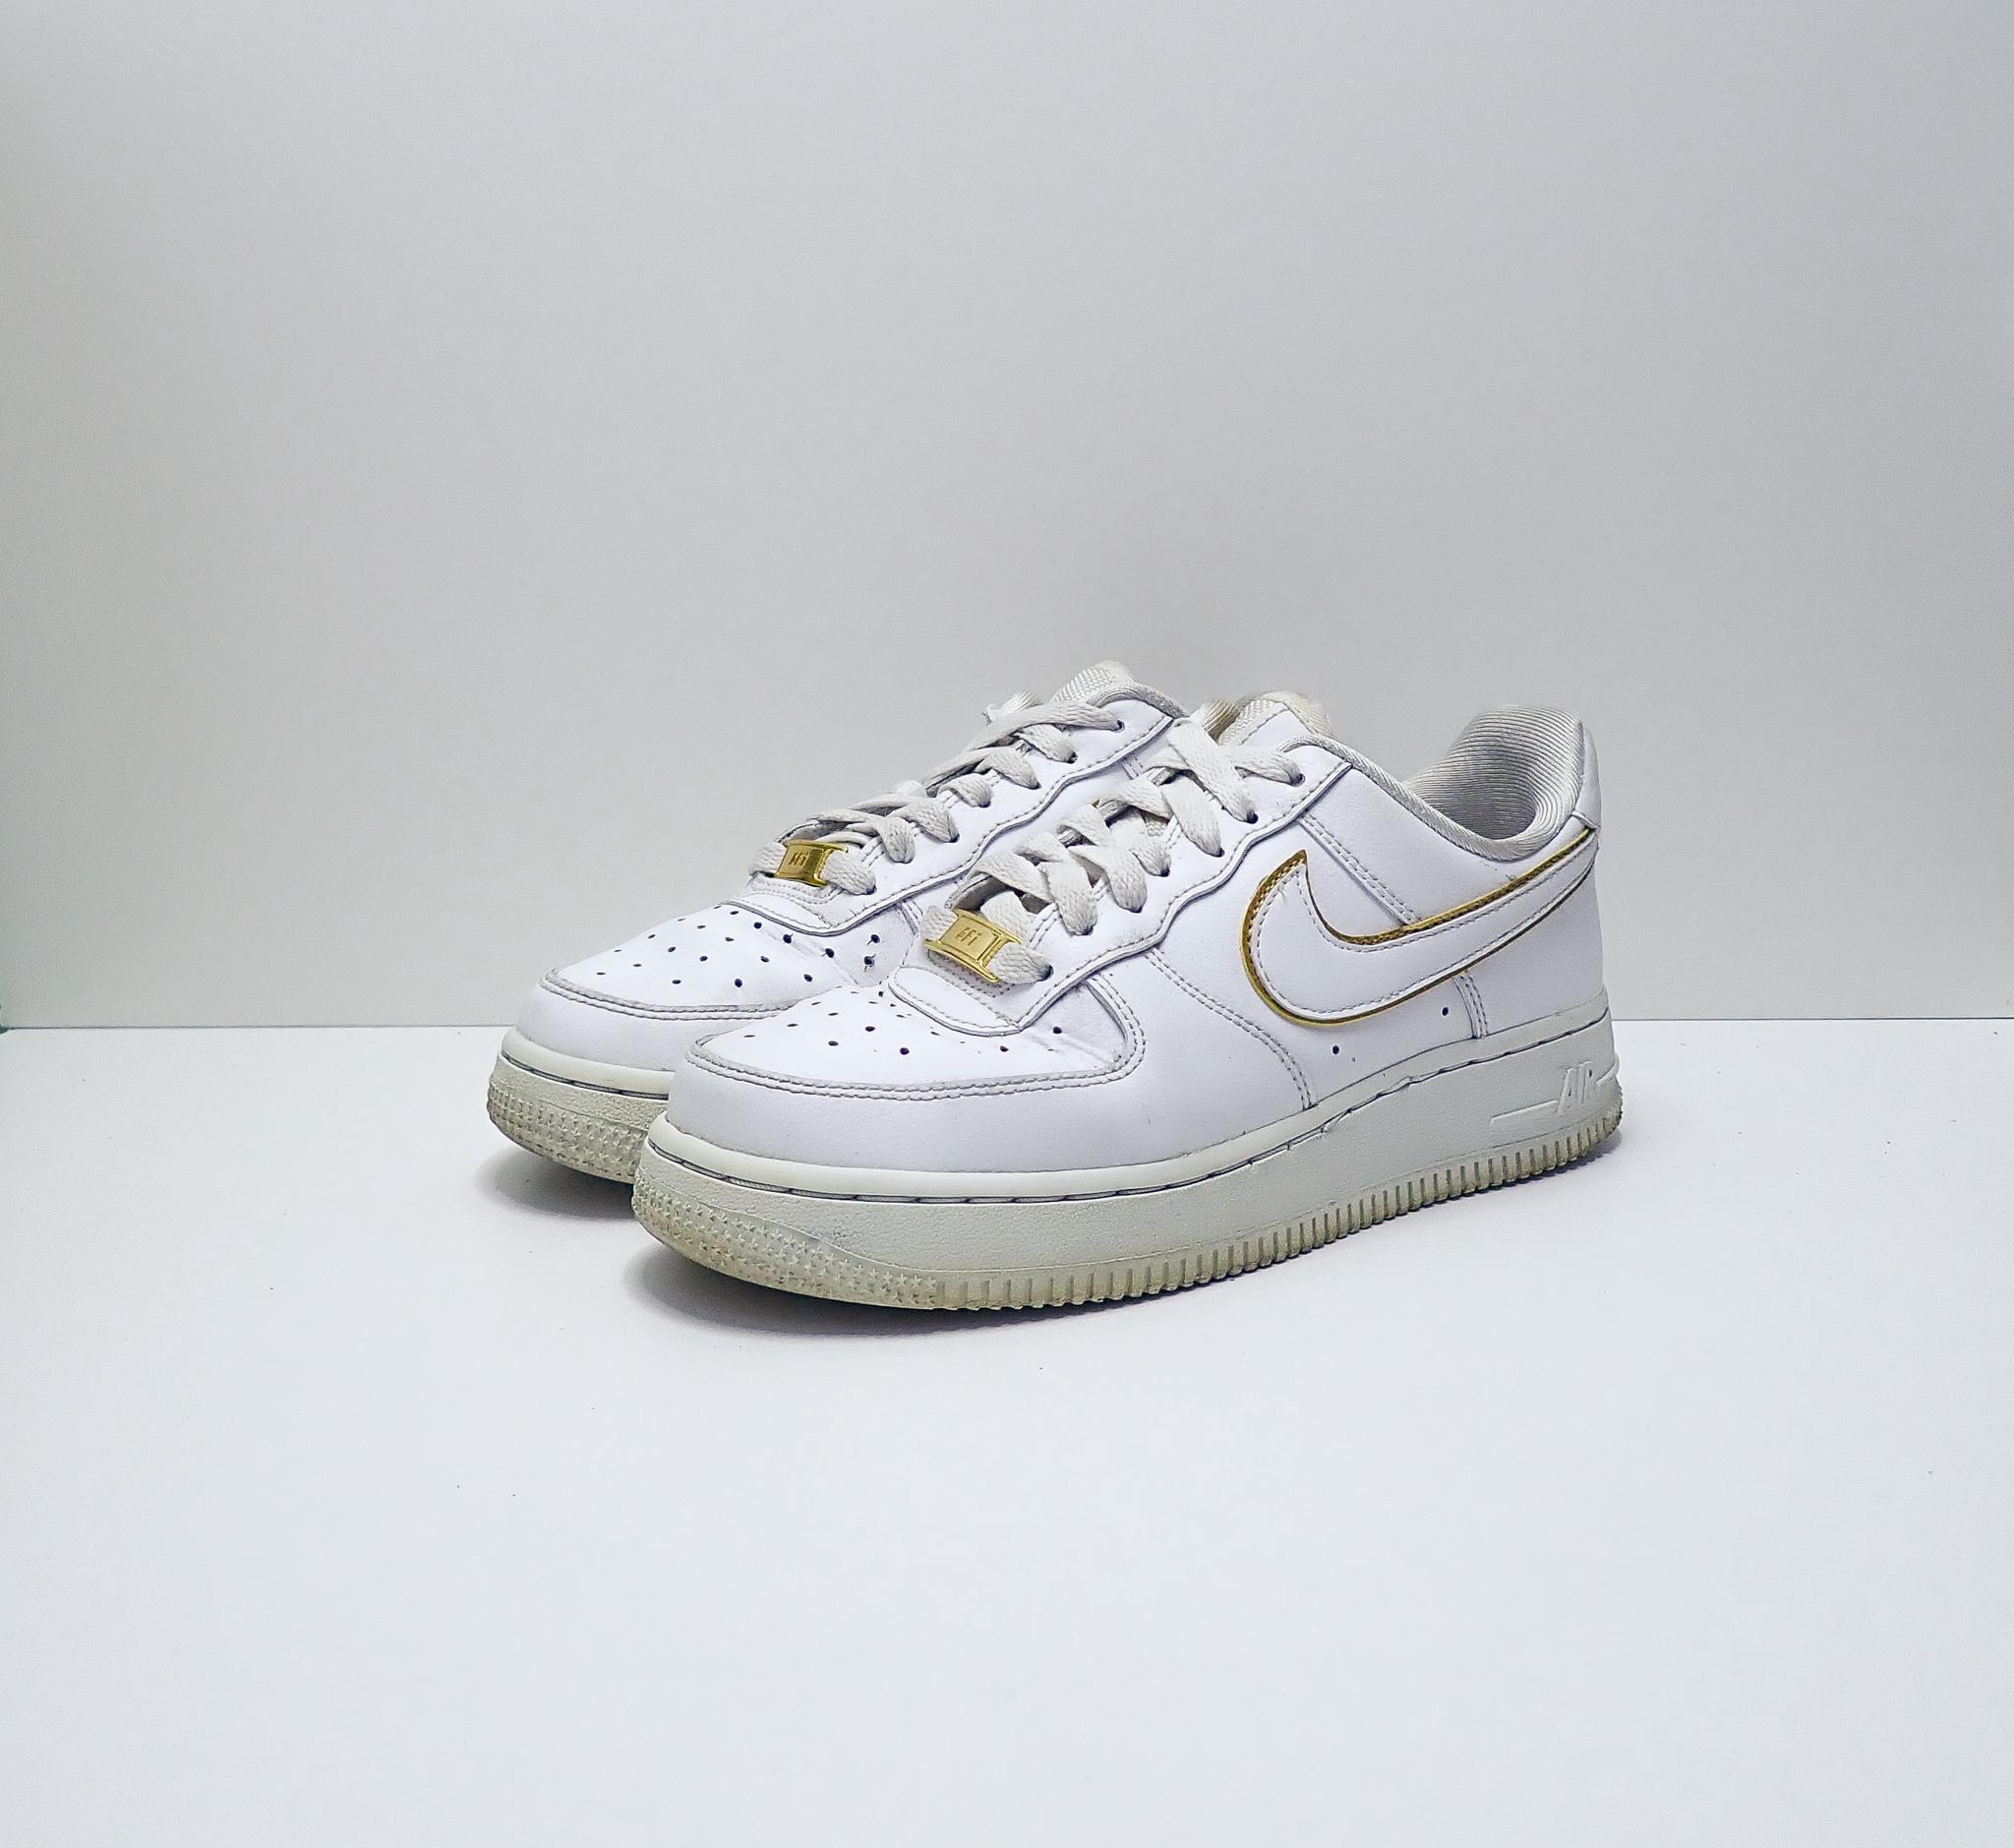 Nike Air Force 1 Low Icon Clash White Metallic Gold (W)